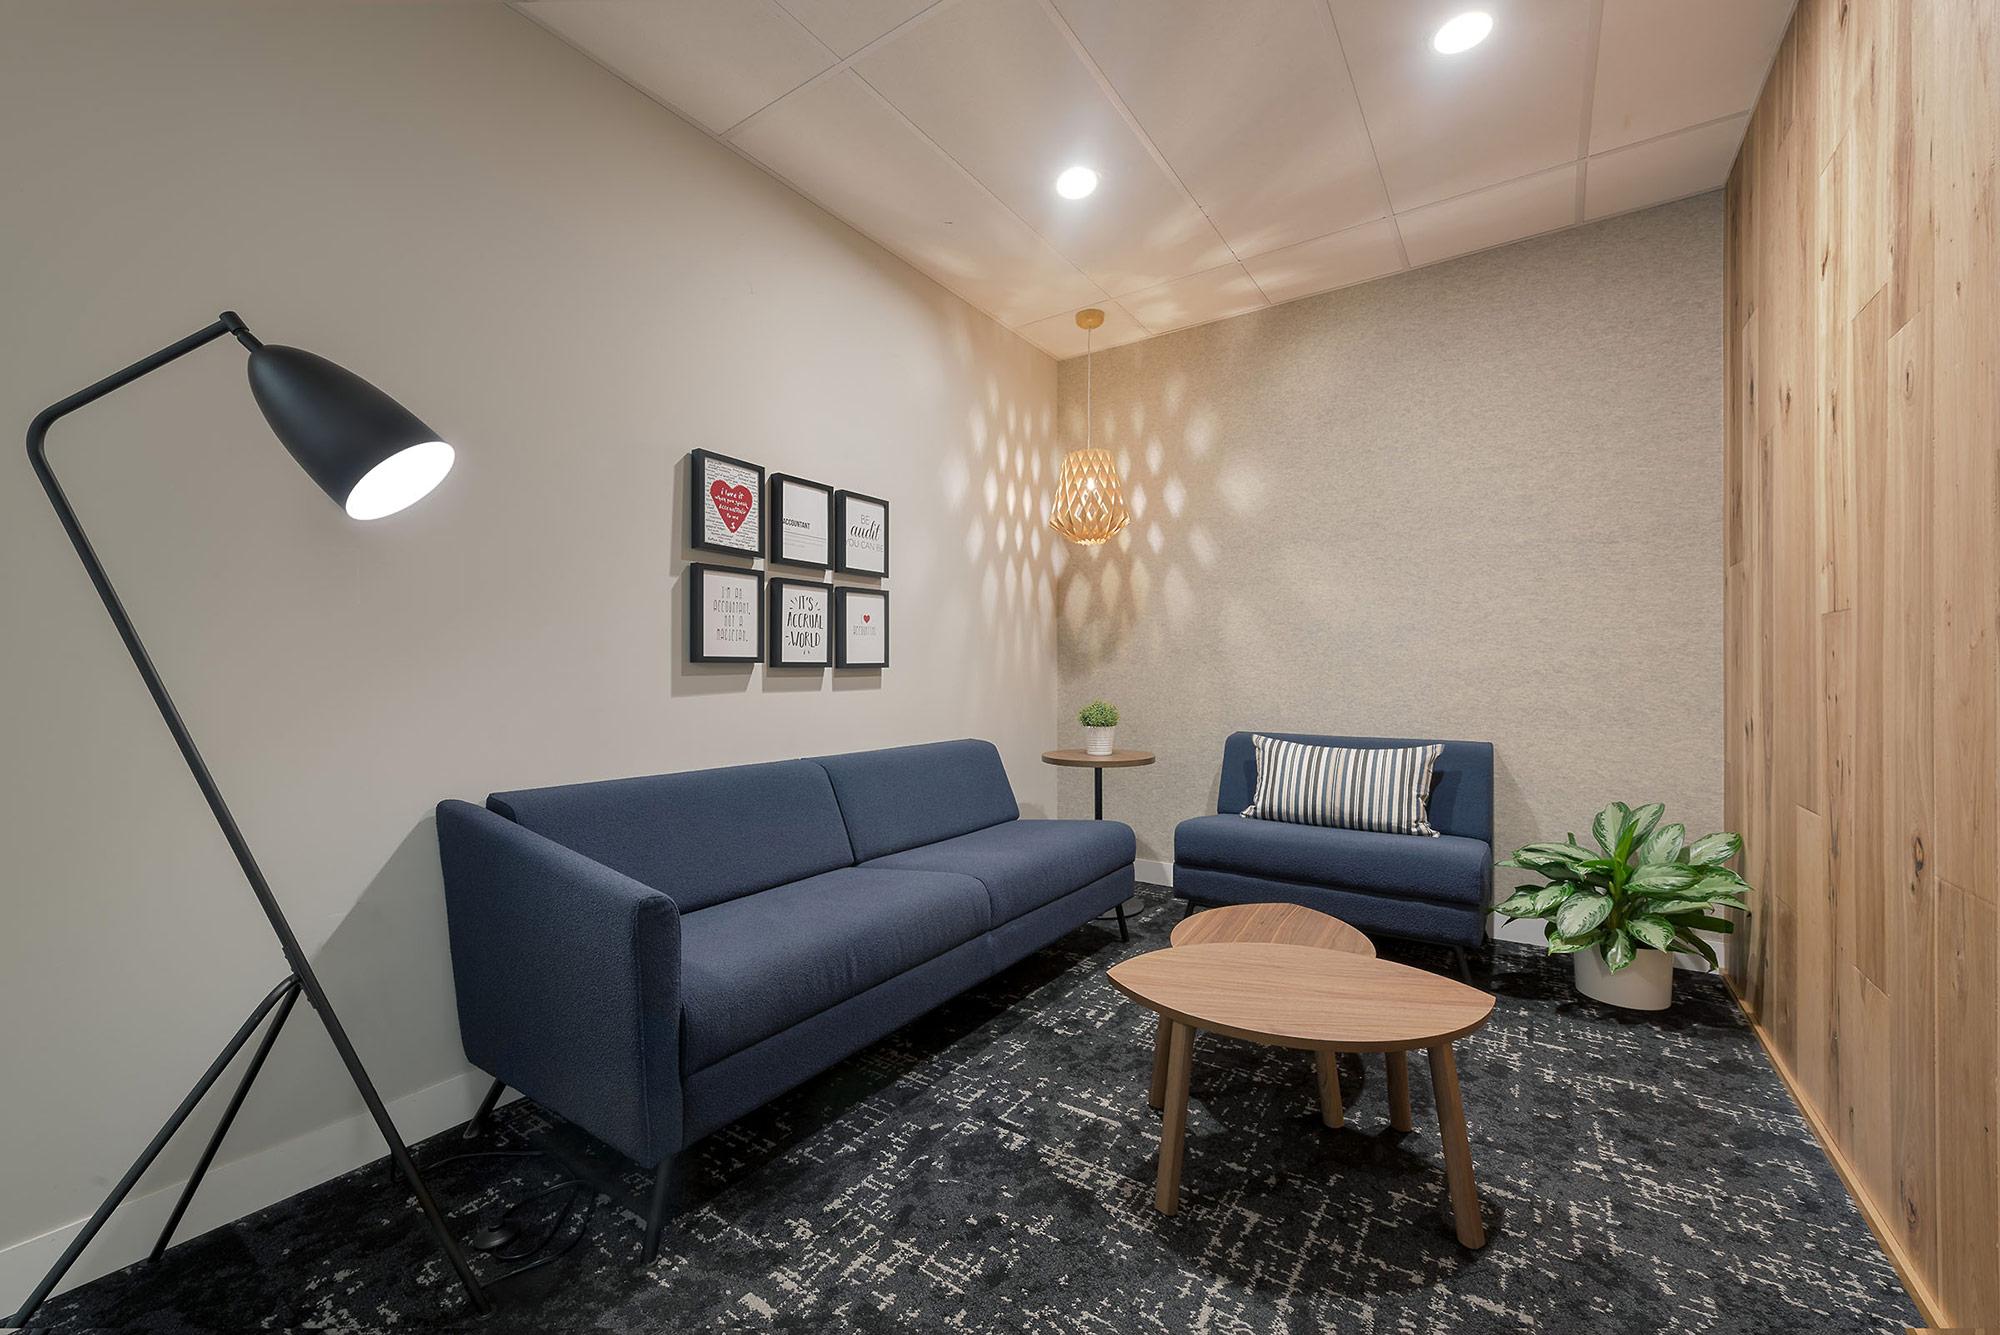 halifax-interior-design-financial-office-seating-area.jpg